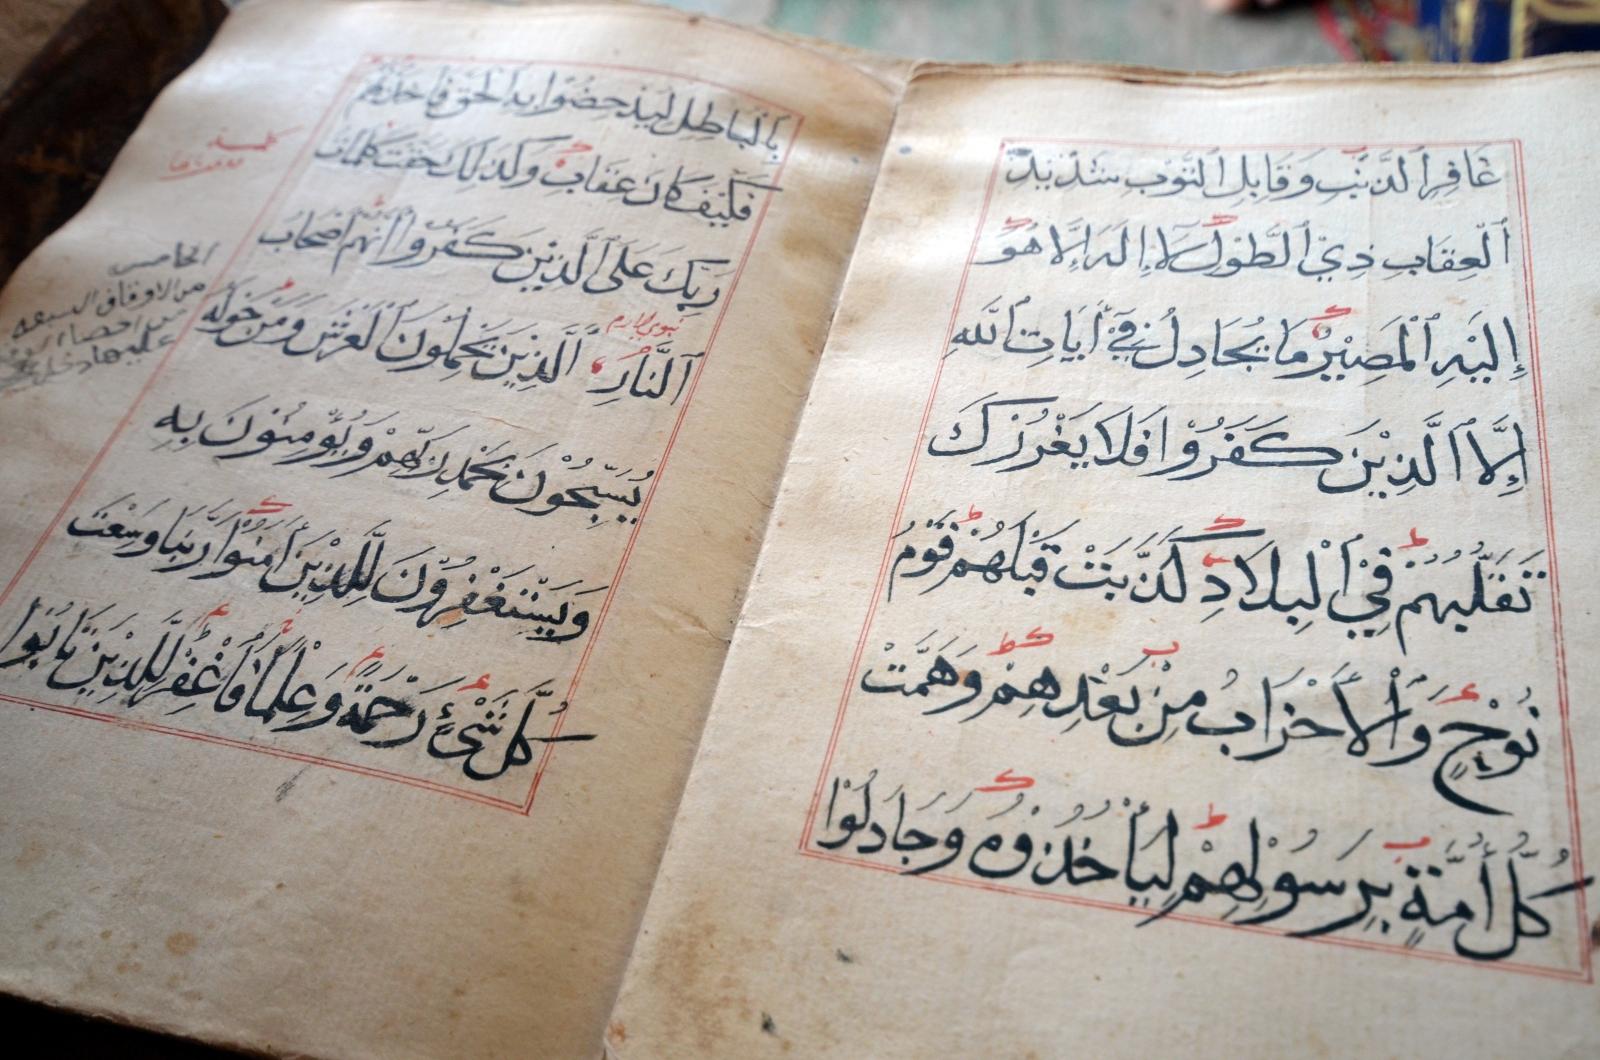 Koran with Arabic caligraphy